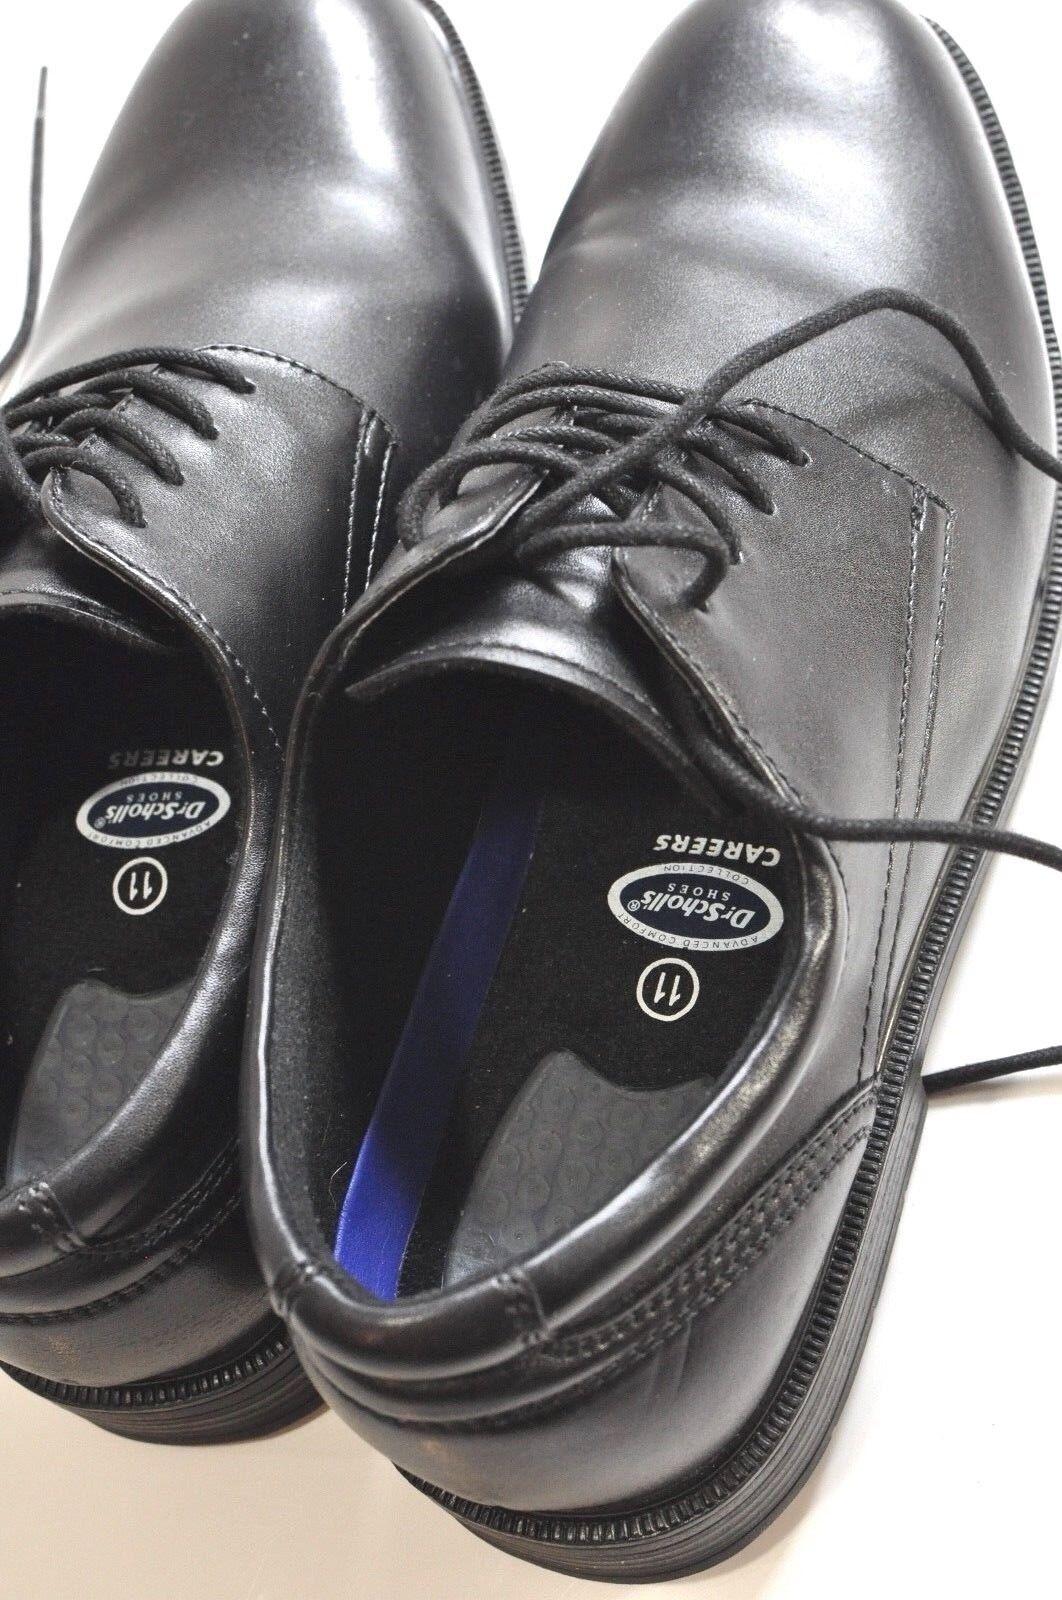 Dr Scholls Careers Mens black oxford shoes size 11